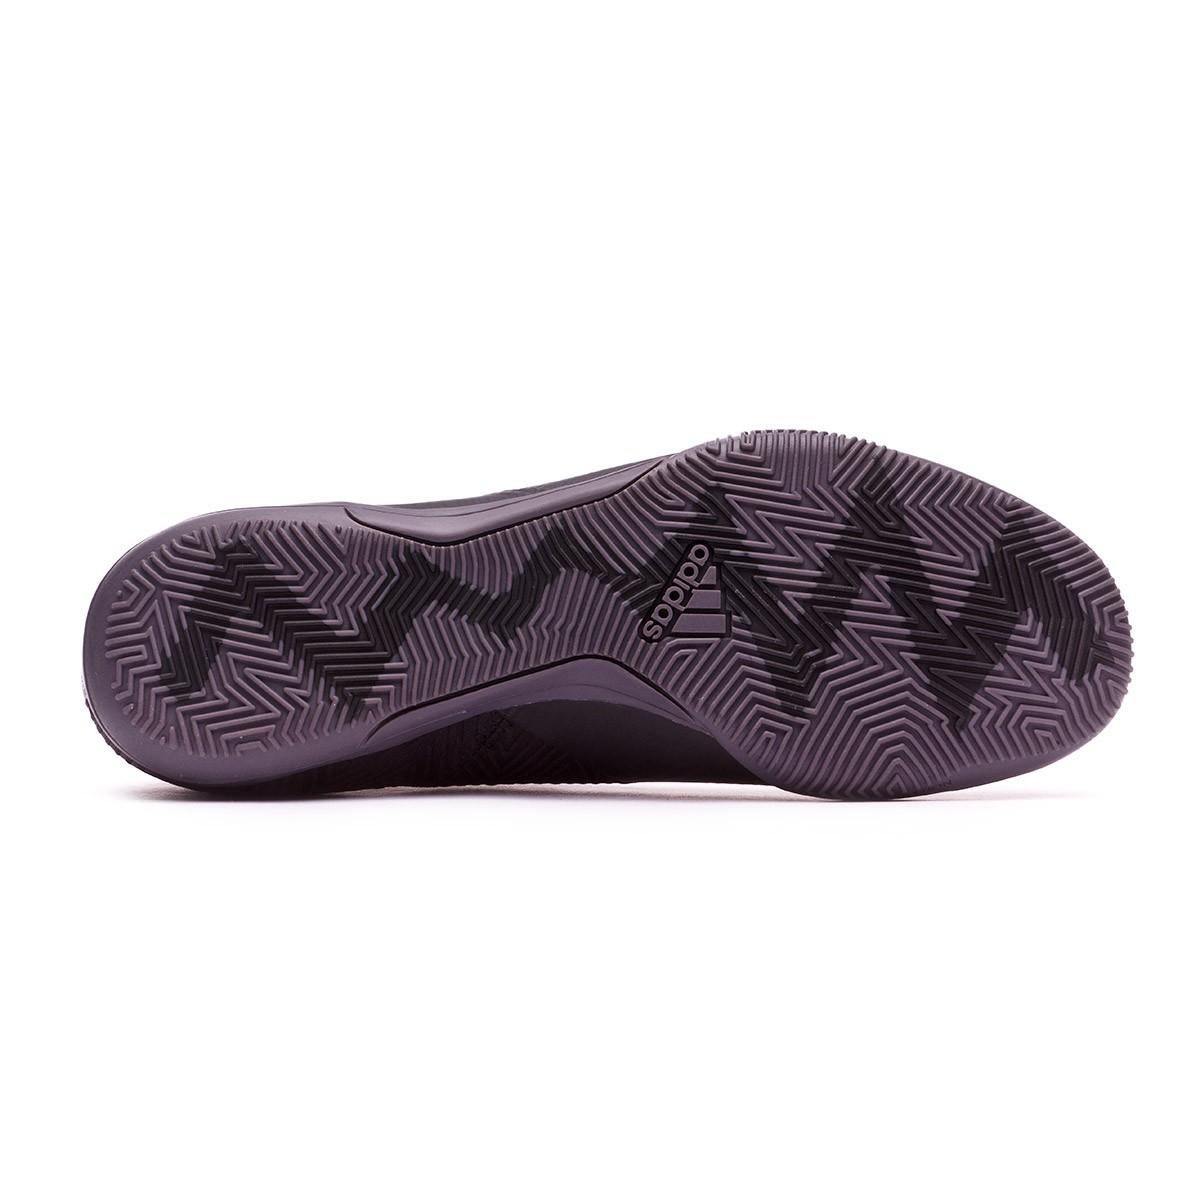 7d6dd98a376 Futsal Boot adidas Nemeziz Tango 18.3 IN Core black-White - Football store  Fútbol Emotion